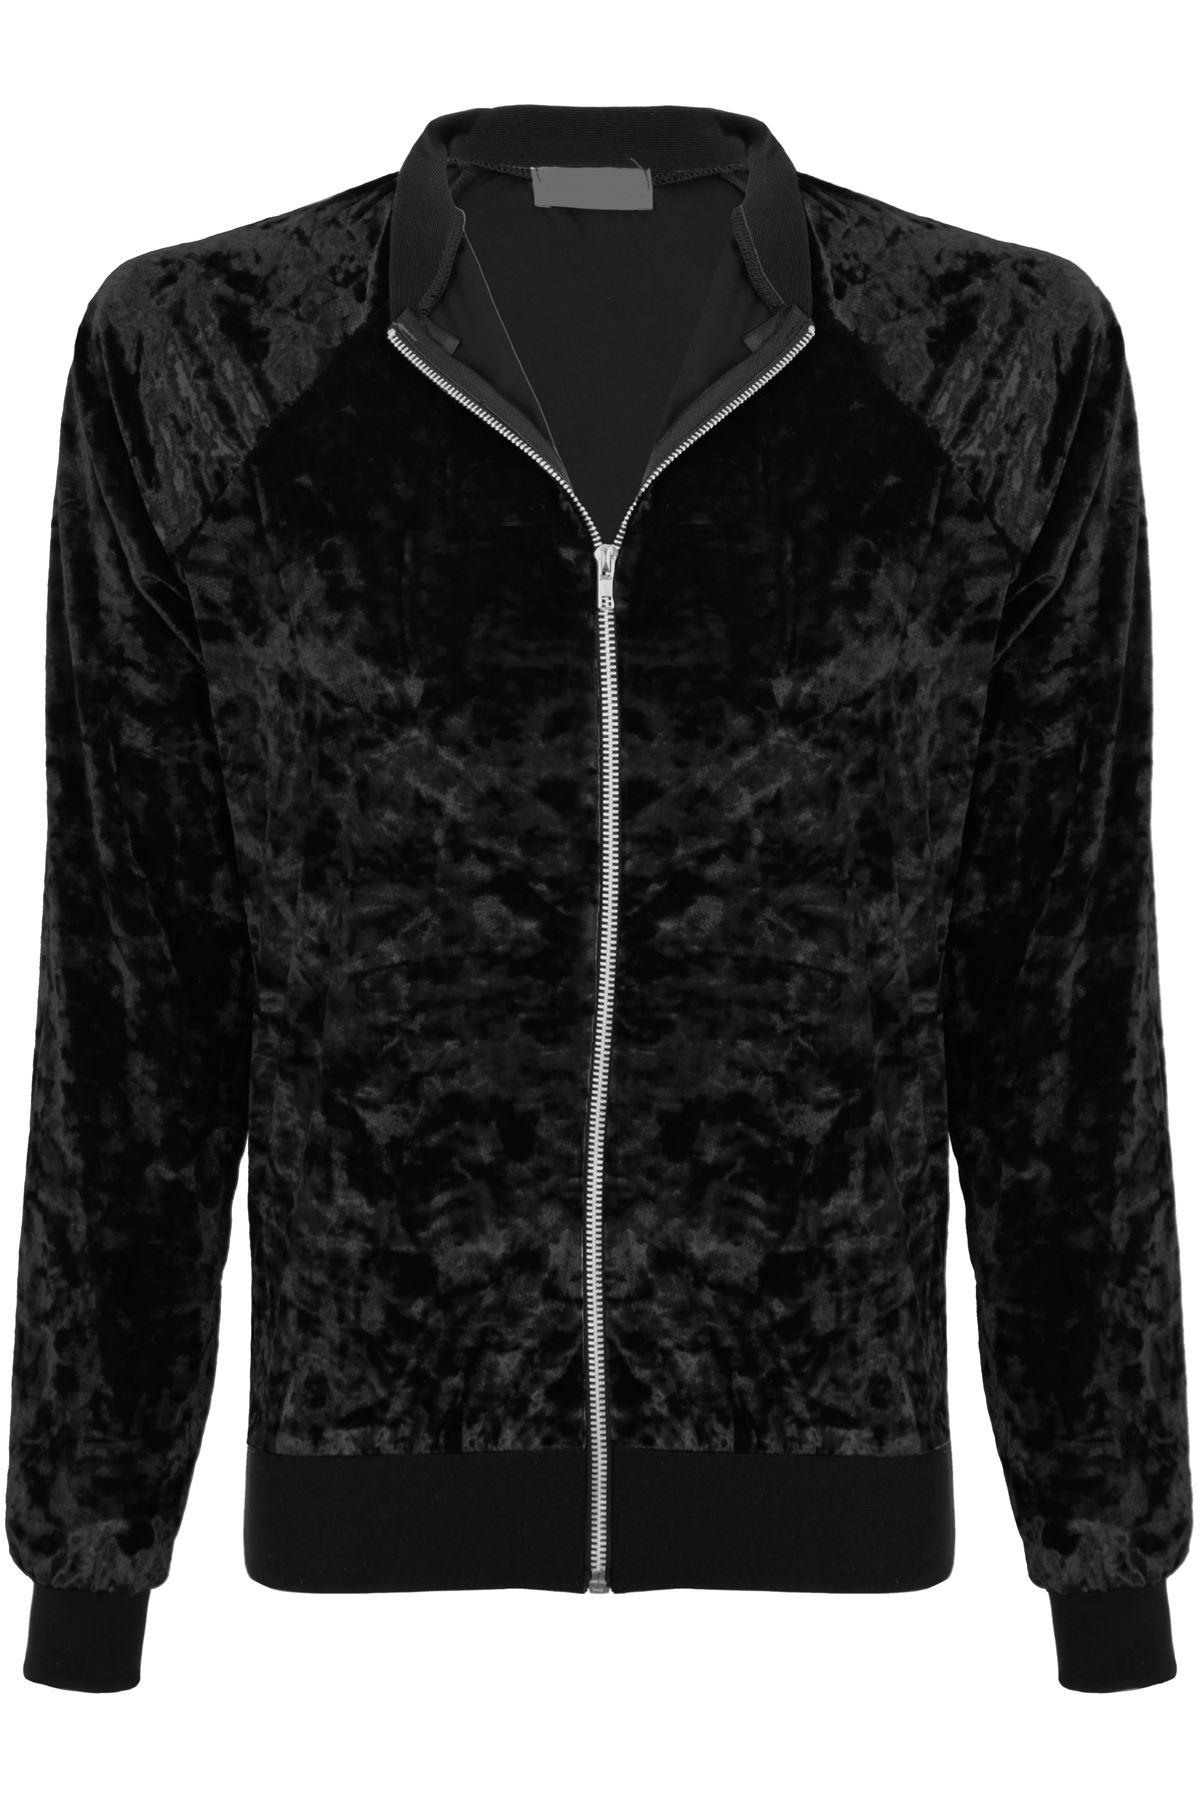 Womens Crushed Velour Velvet A1 Zip Up Top Varsity Bomber Jacket Sweatshirt